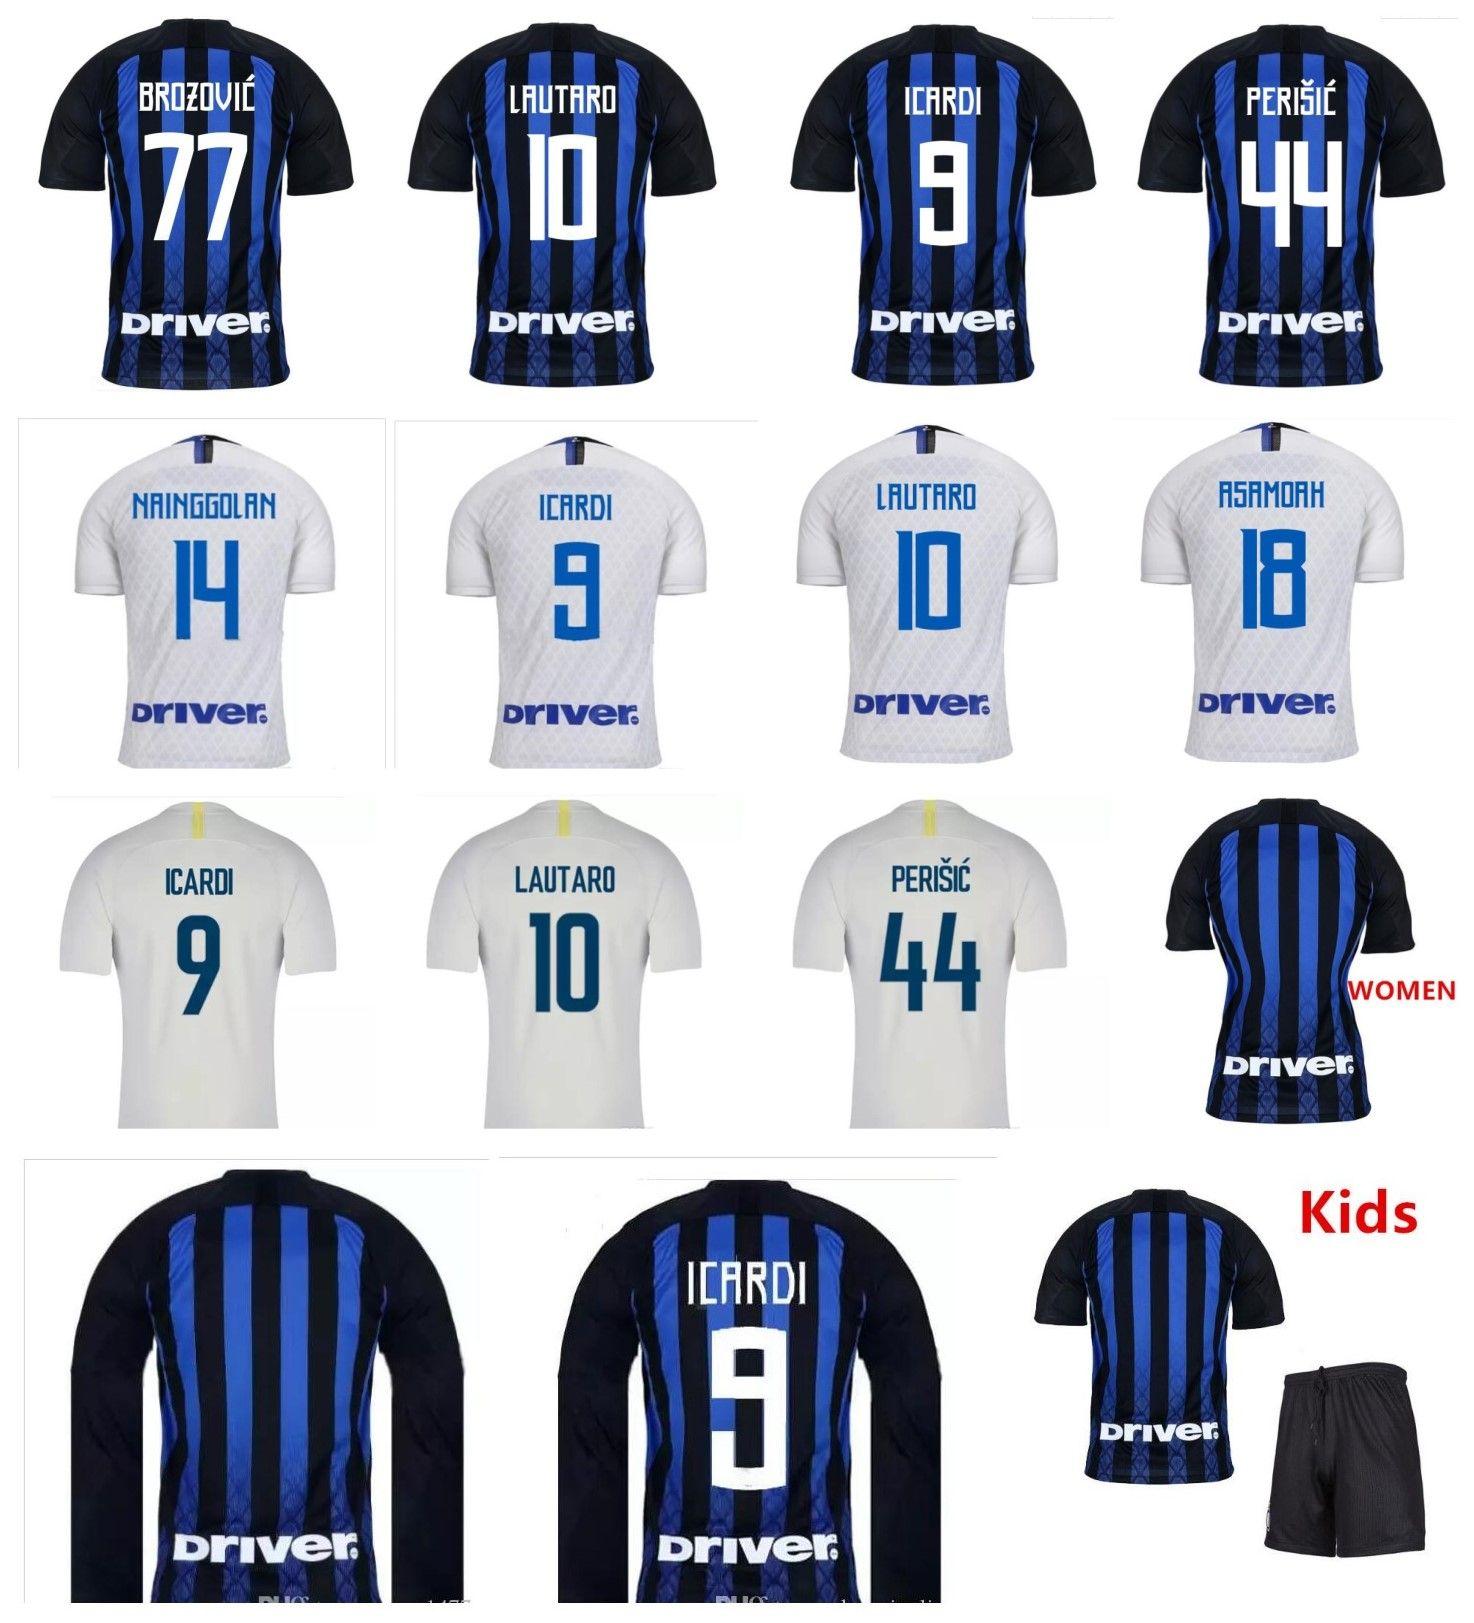 2019 New Top Thai 2019 Inter Jersey 18 19 Soccer Jersey MilAn Football Shirt  ICARDI Uniforms PERISIC Nainggolan Lauturo Skriniar 2018 Kids Kits From ... 4681085b5